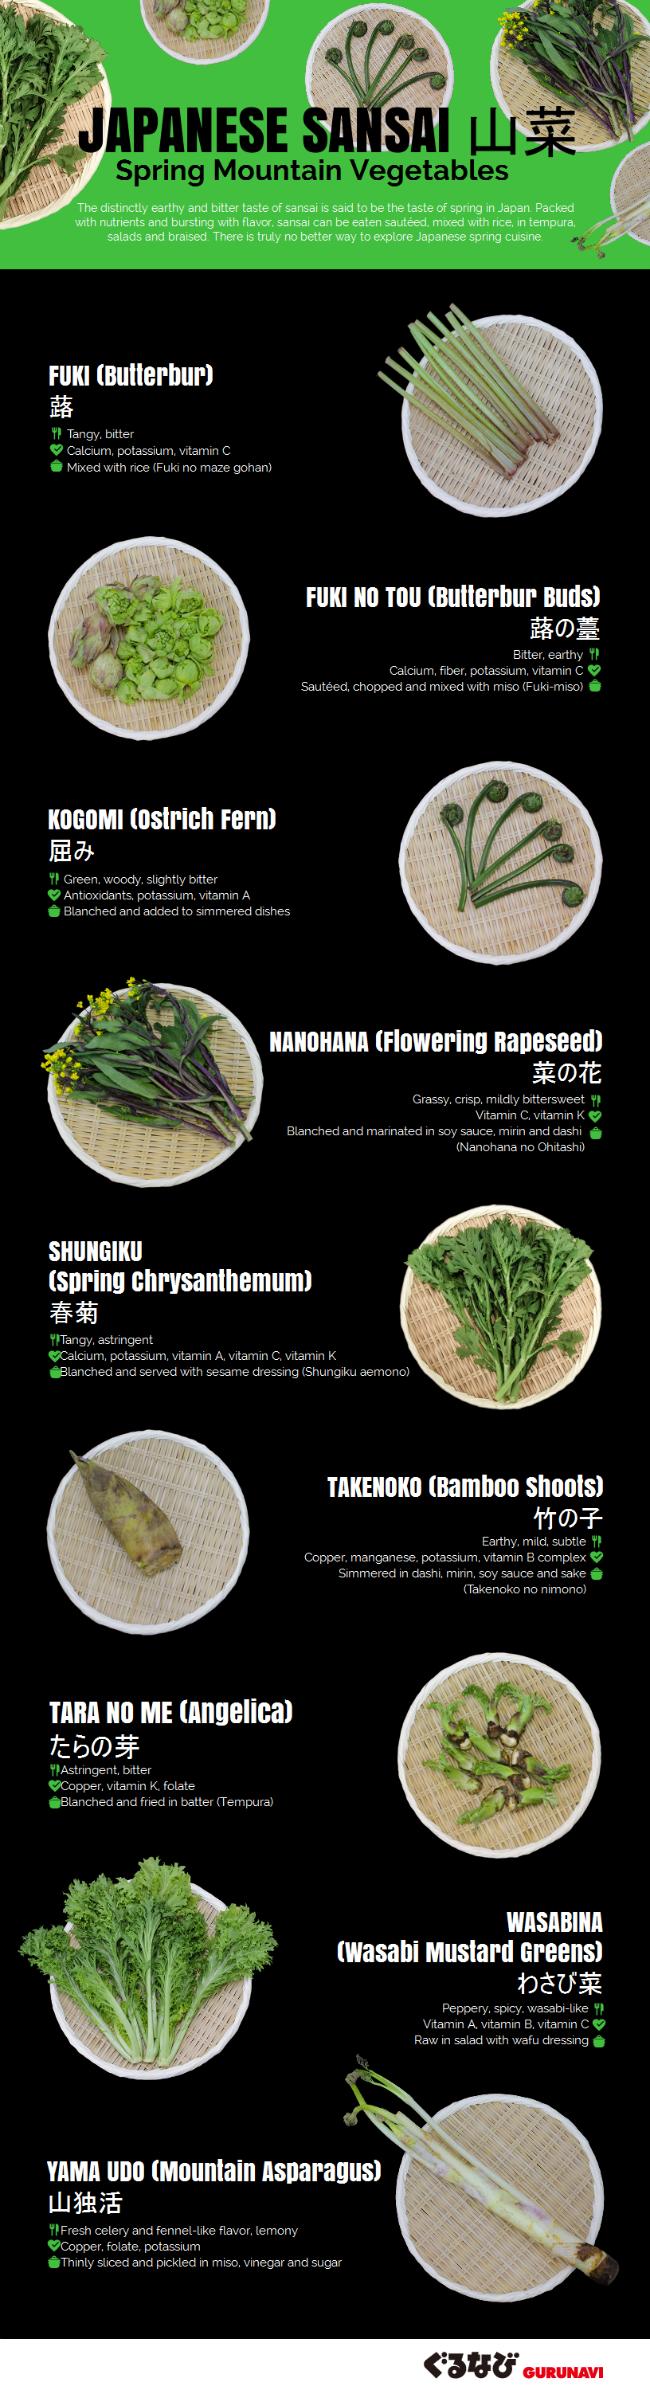 Japanese Sansai: 9 Spring Mountain Vegetables from Japan